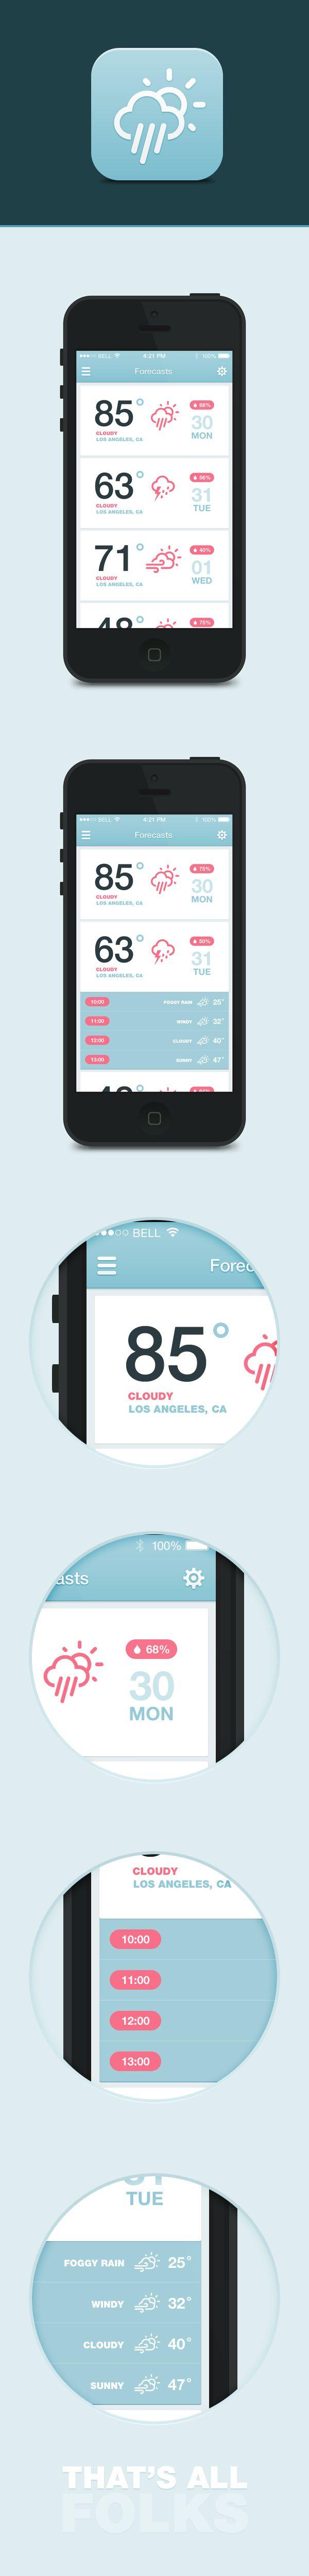 iOS7 Weather App / Dmitriy Haraberush